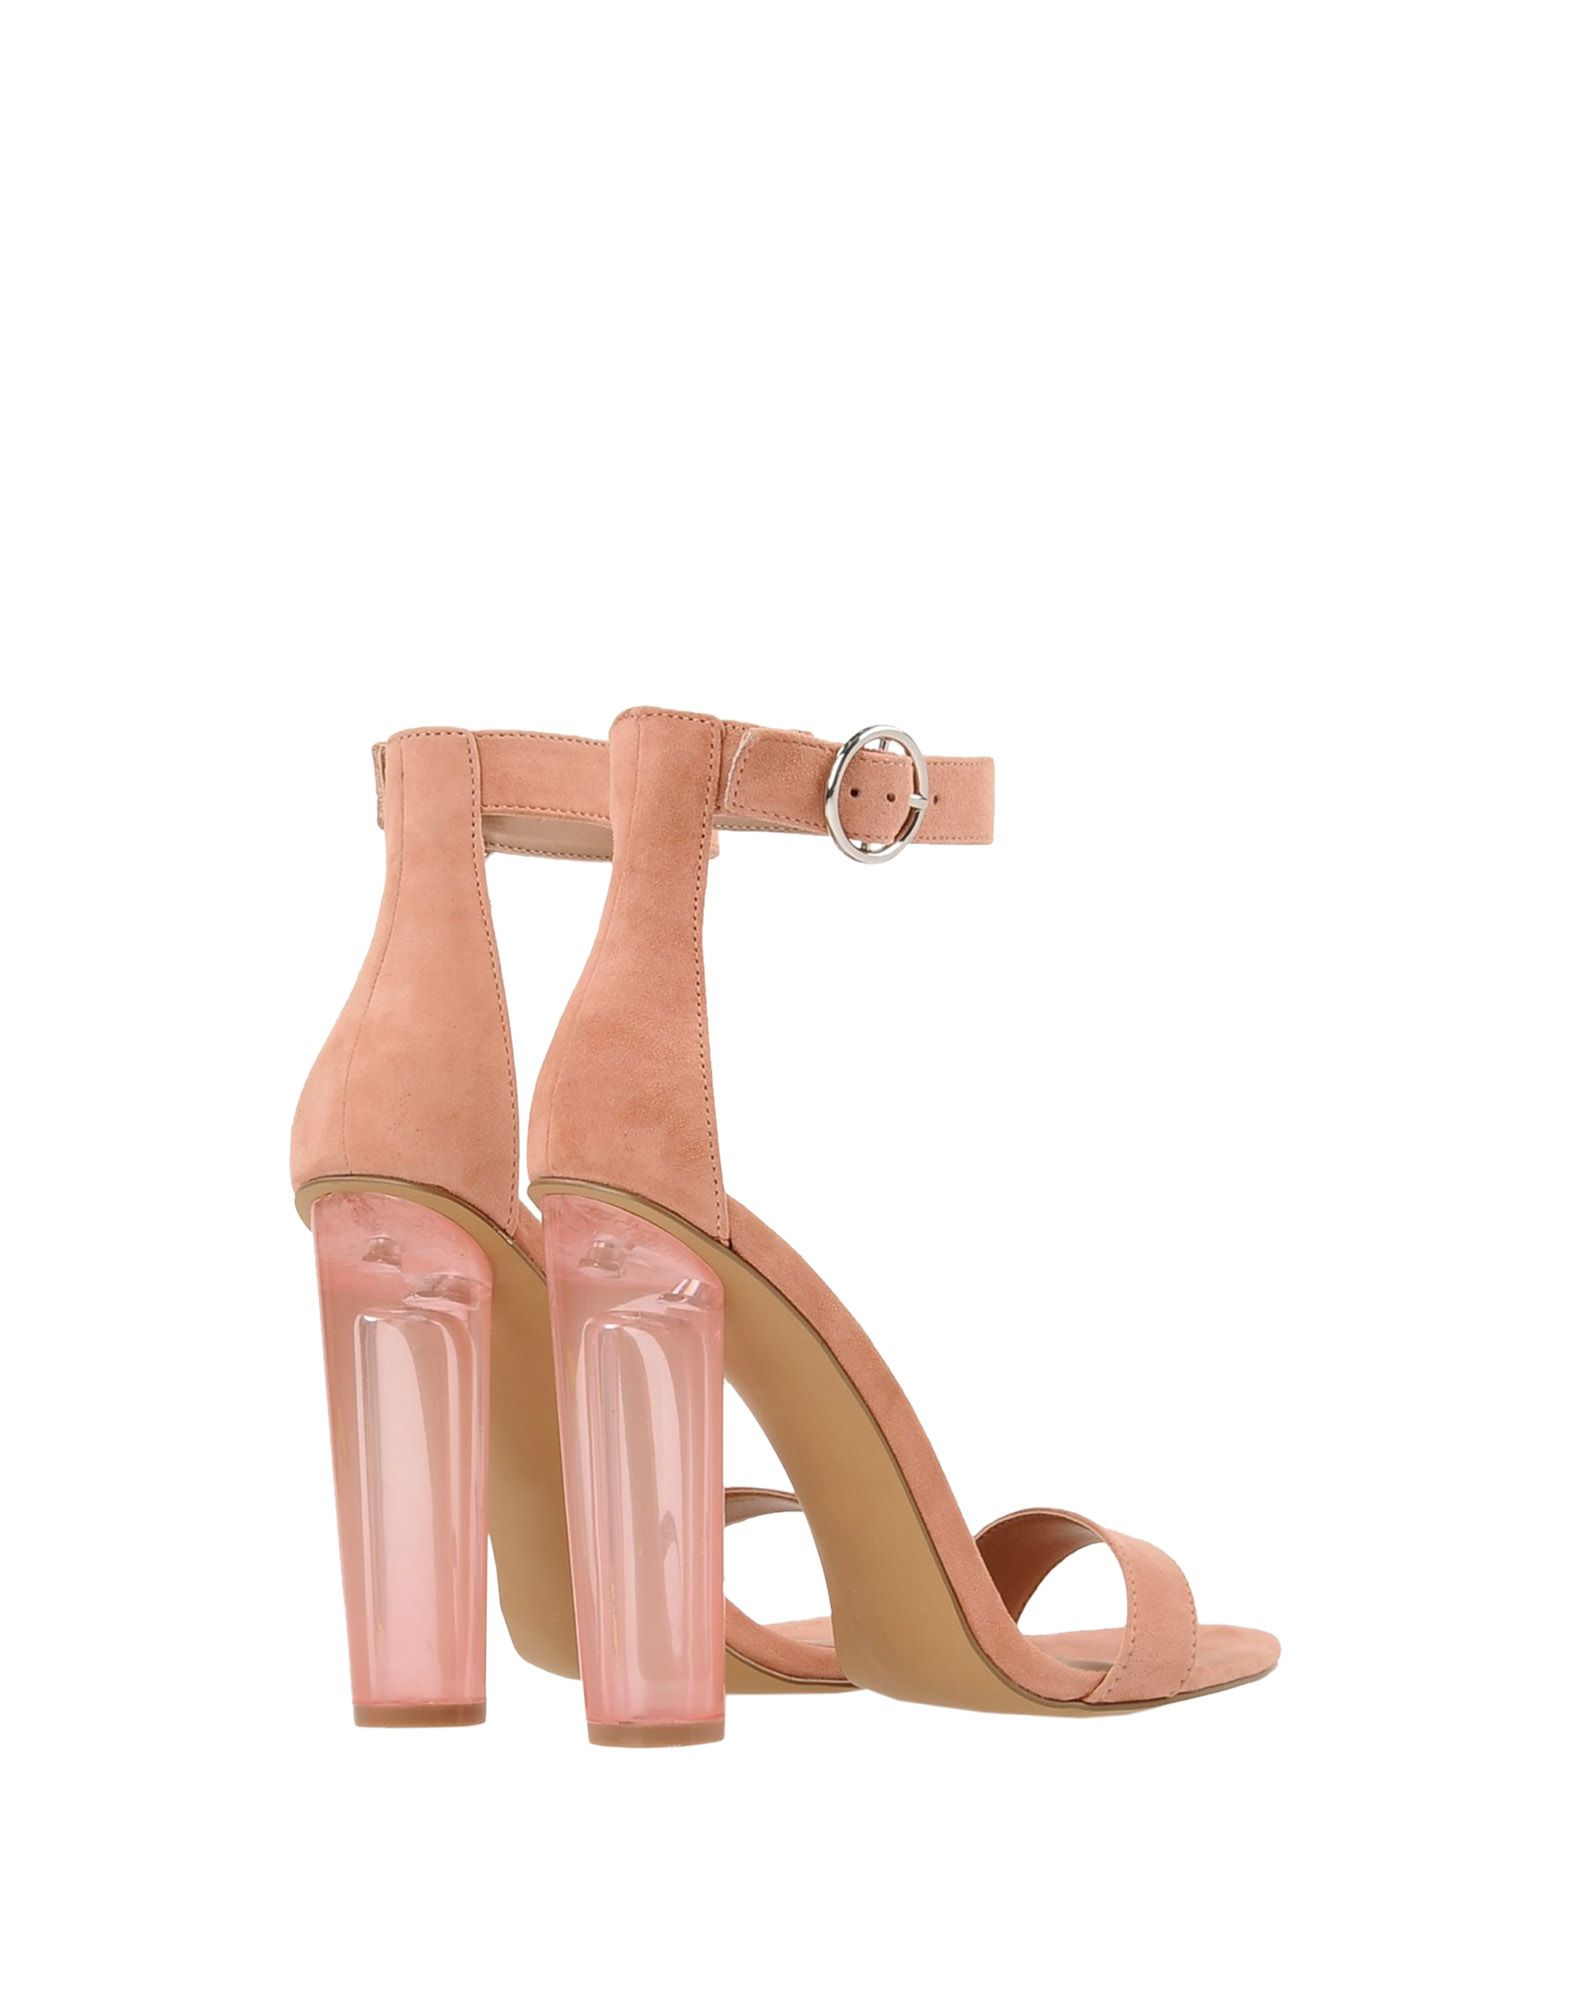 Steve Madden Teaser 11436790IF Sandal  11436790IF Teaser Gute Qualität beliebte Schuhe 254049